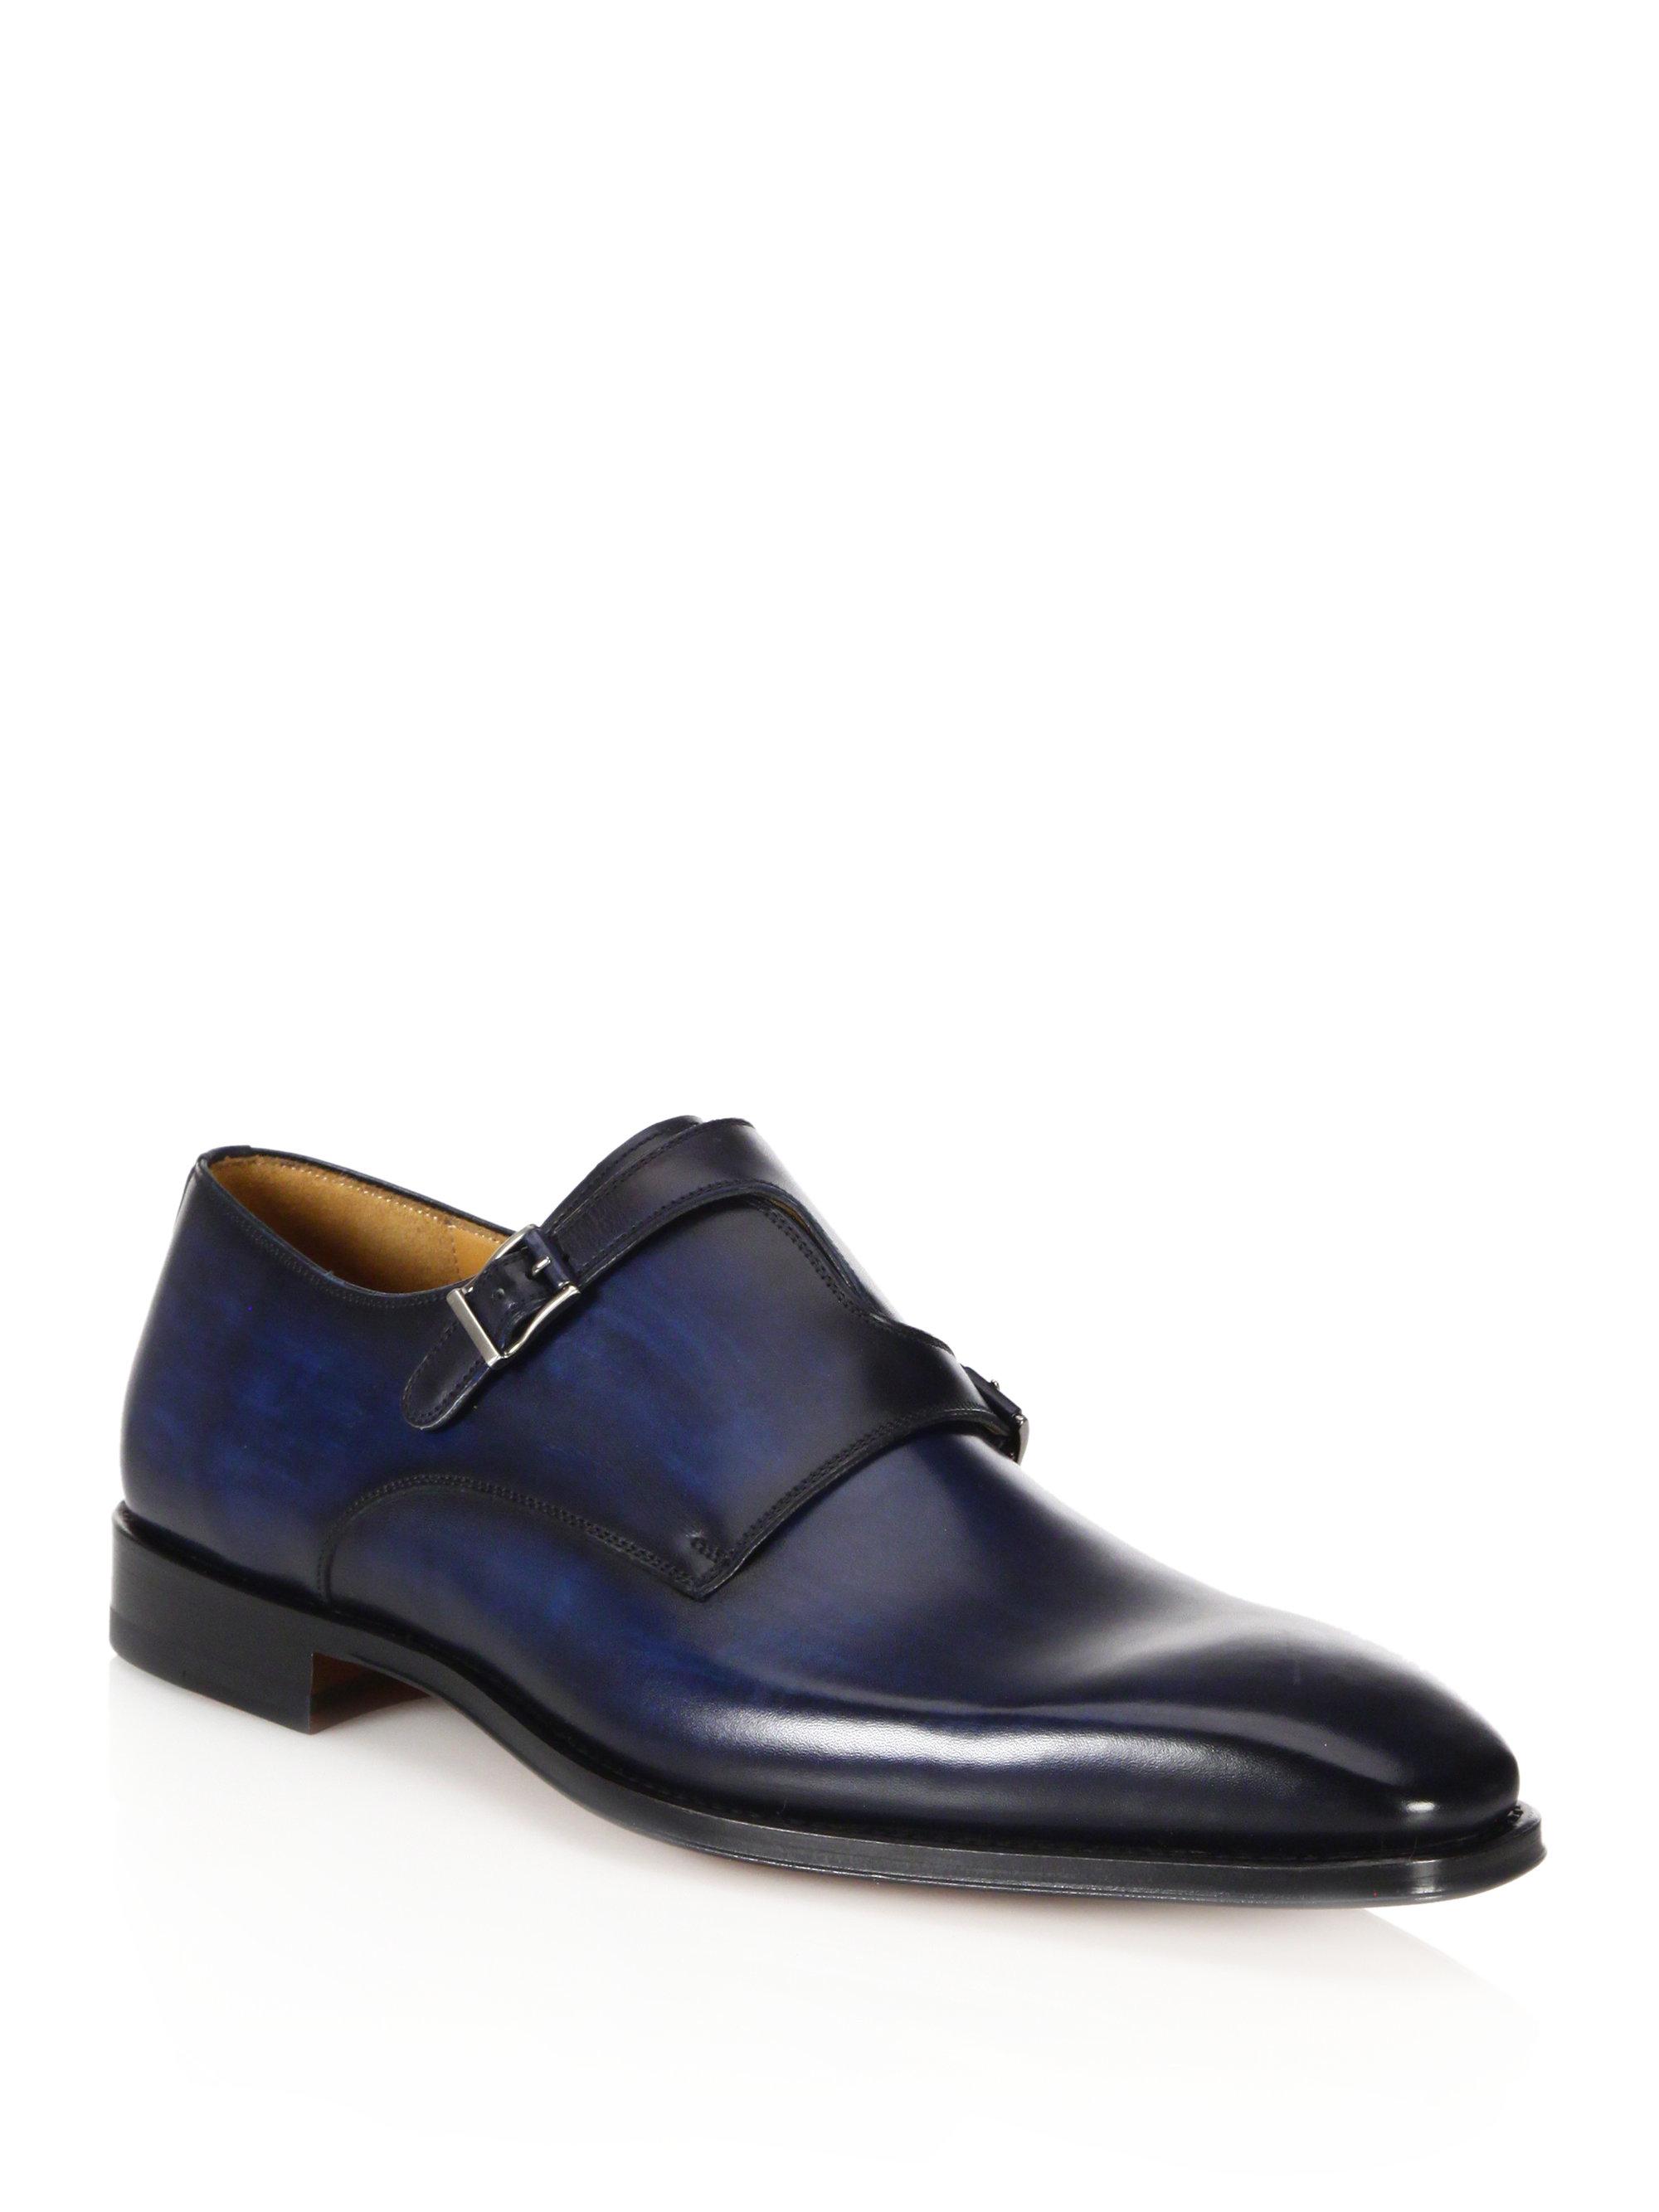 Mens Dress Shoes Saks